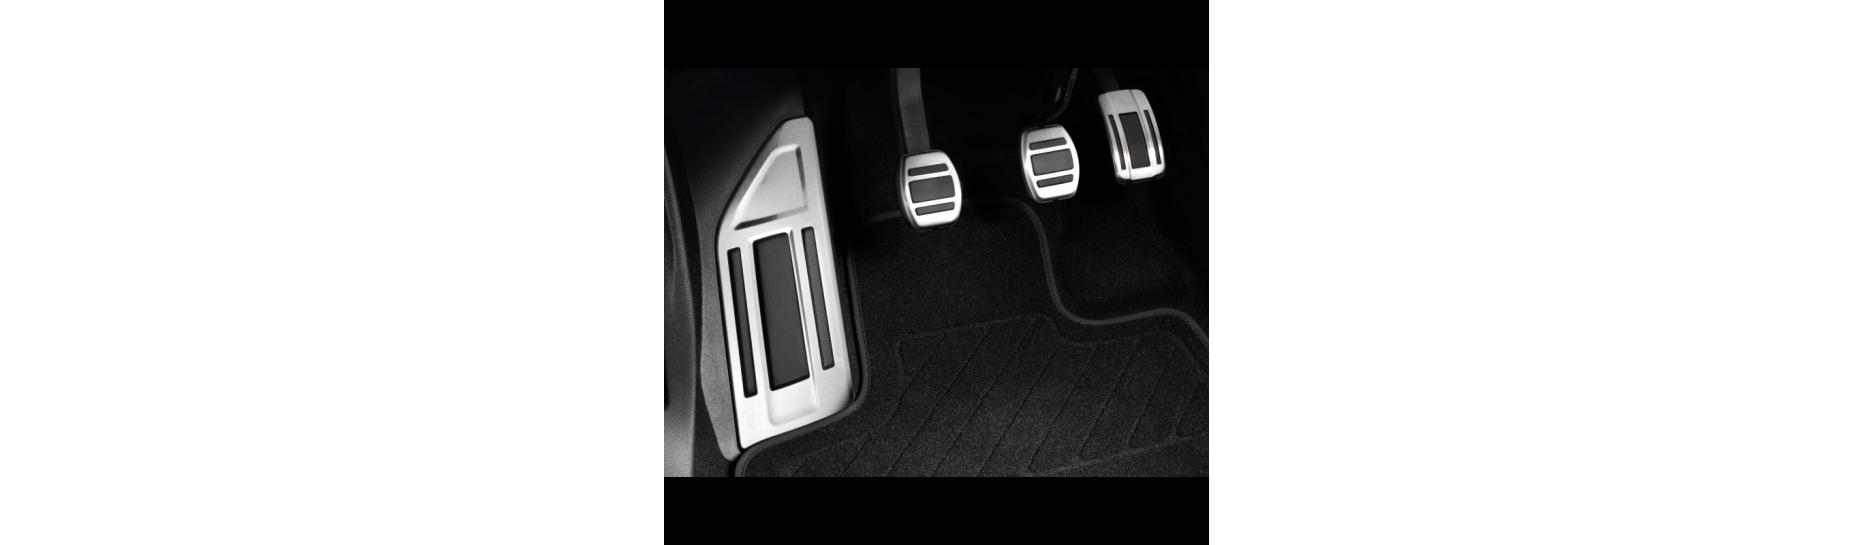 Pedale und Fußstützen Peugeot